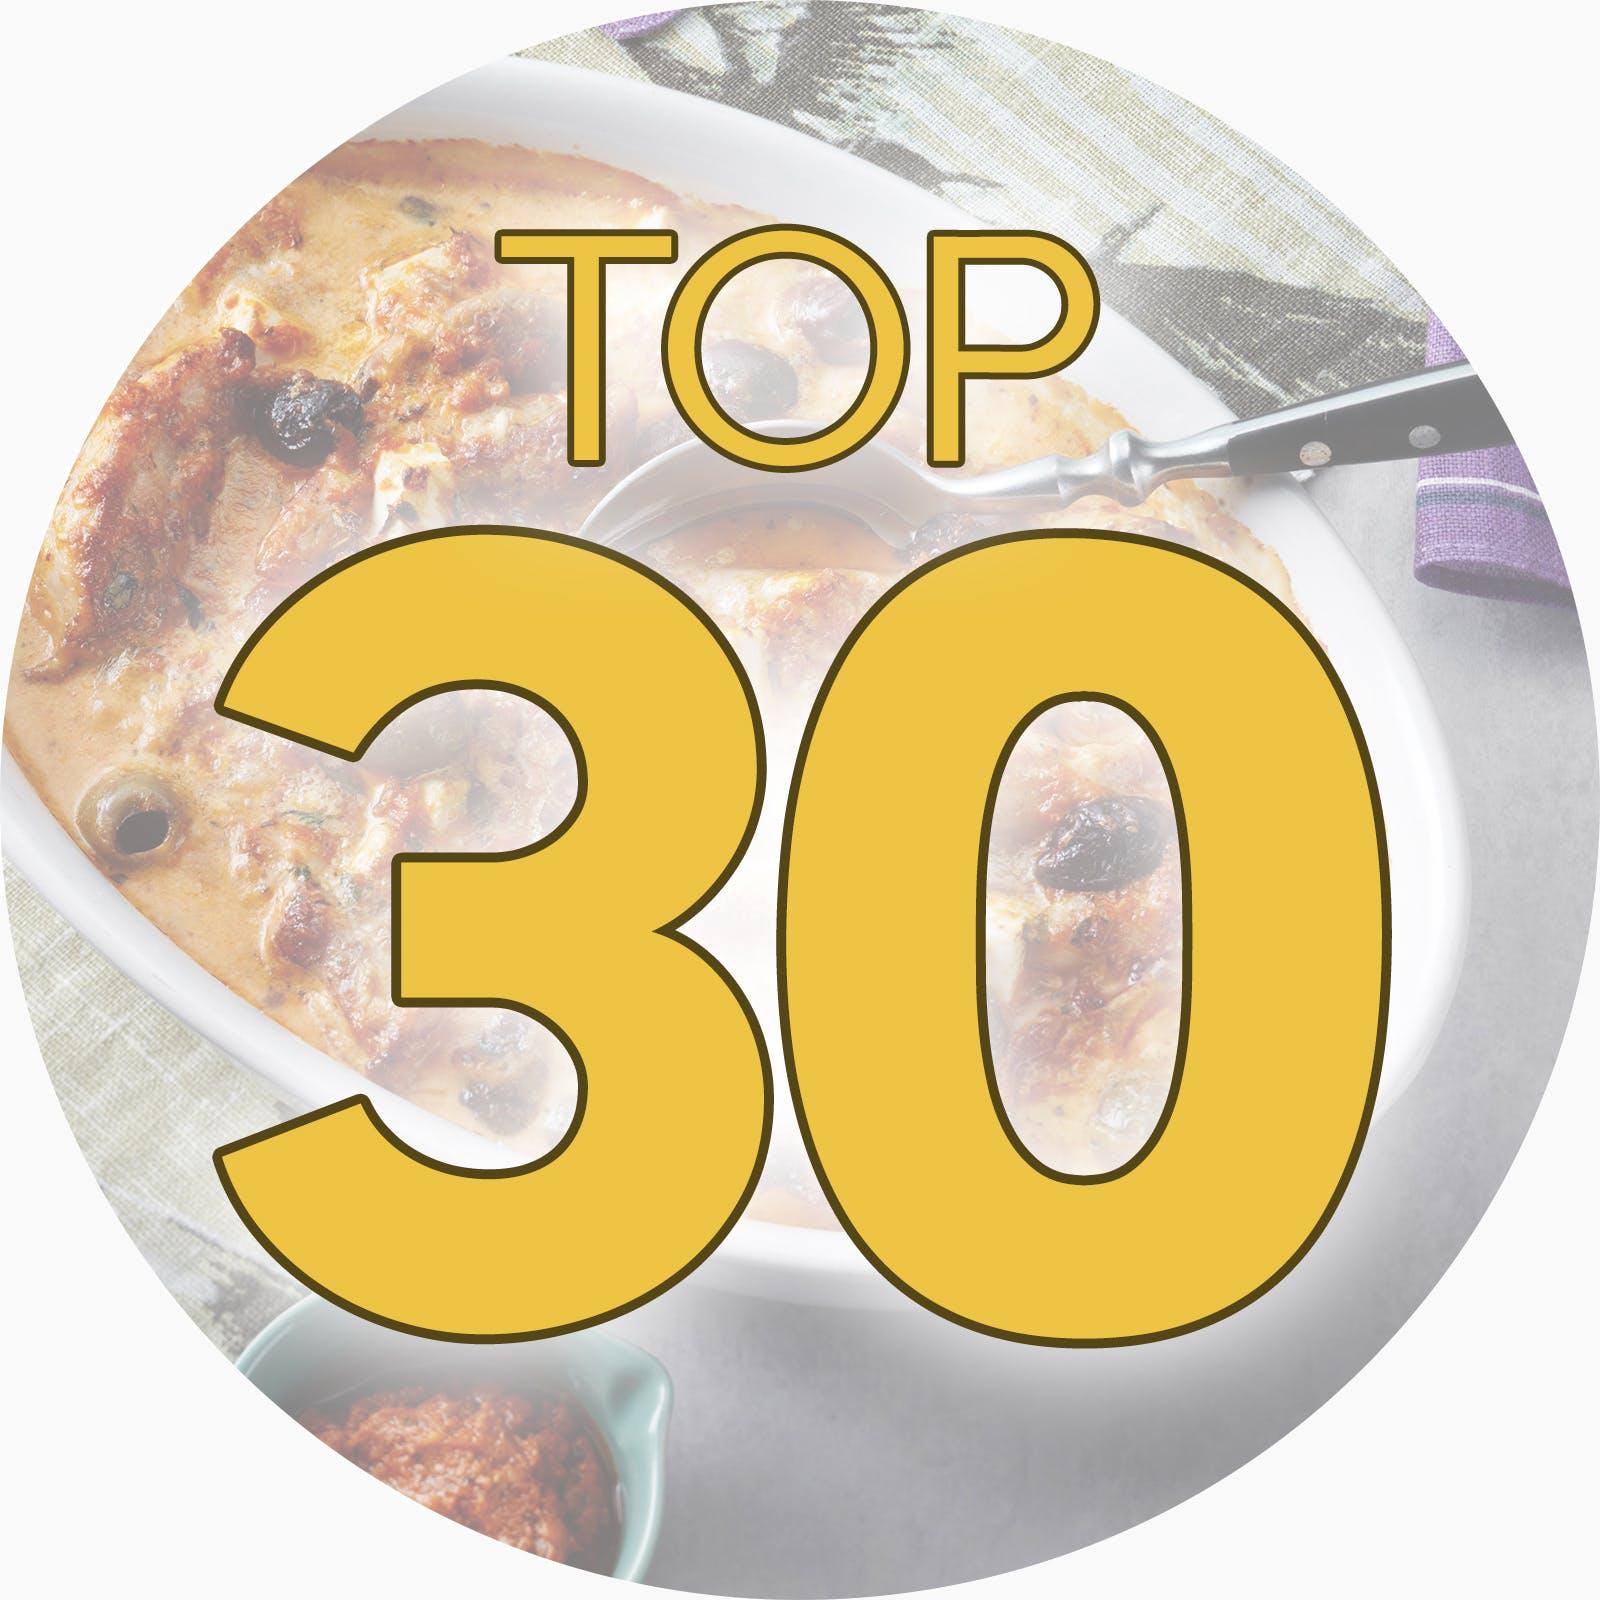 Top30-1600Meals-f9